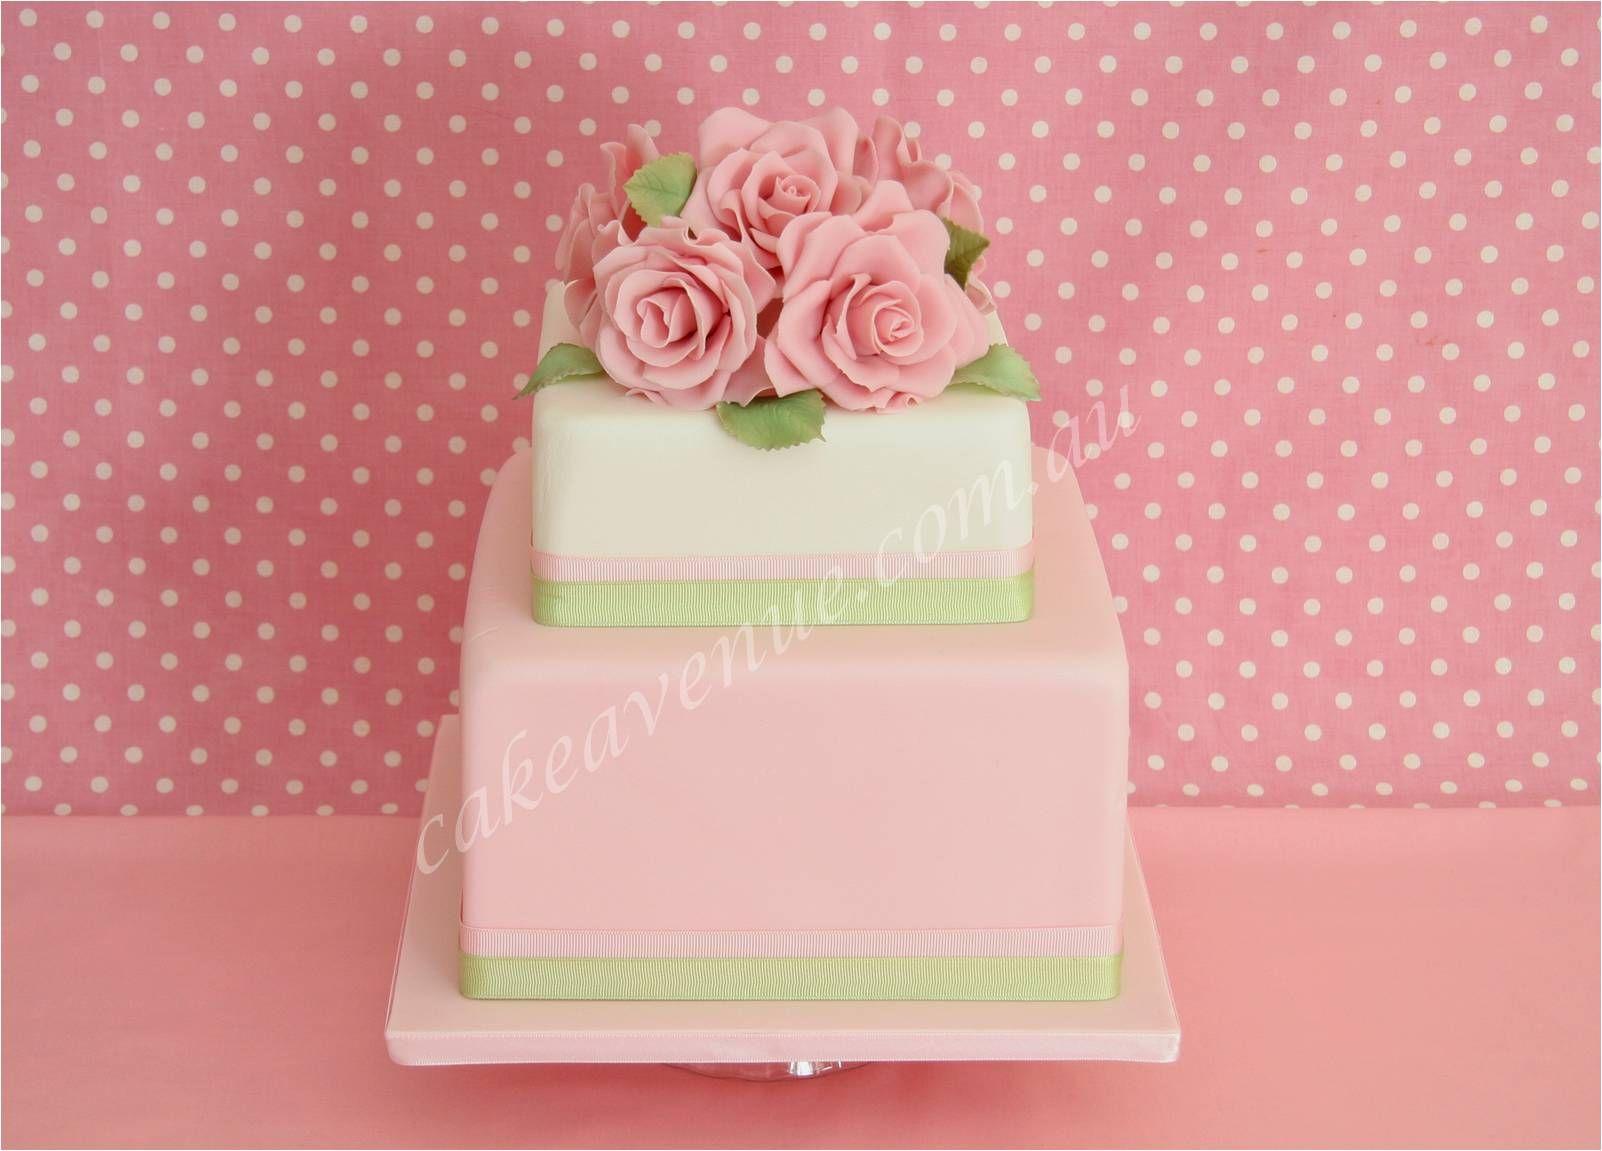 Pretty Pink and Green Wedding Cake ᘡղbᘠ | Wedding Cakes | Pinterest